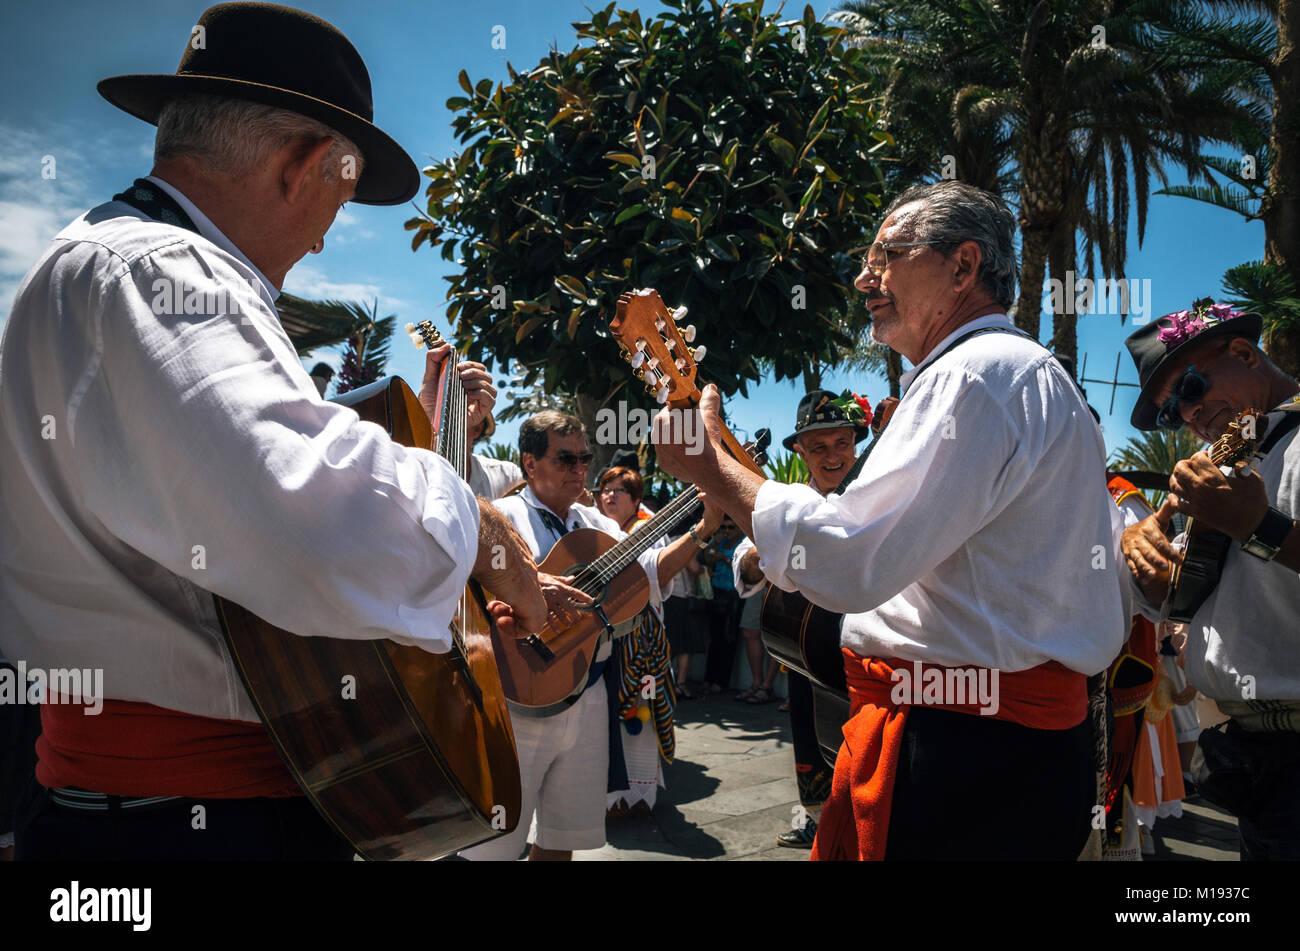 Puerto de la Cruz, Teneriffa, Kanarische Inseln - 30. Mai 2017: Kanaren Menschen in traditionellen Kleidern bekleidet Stockbild